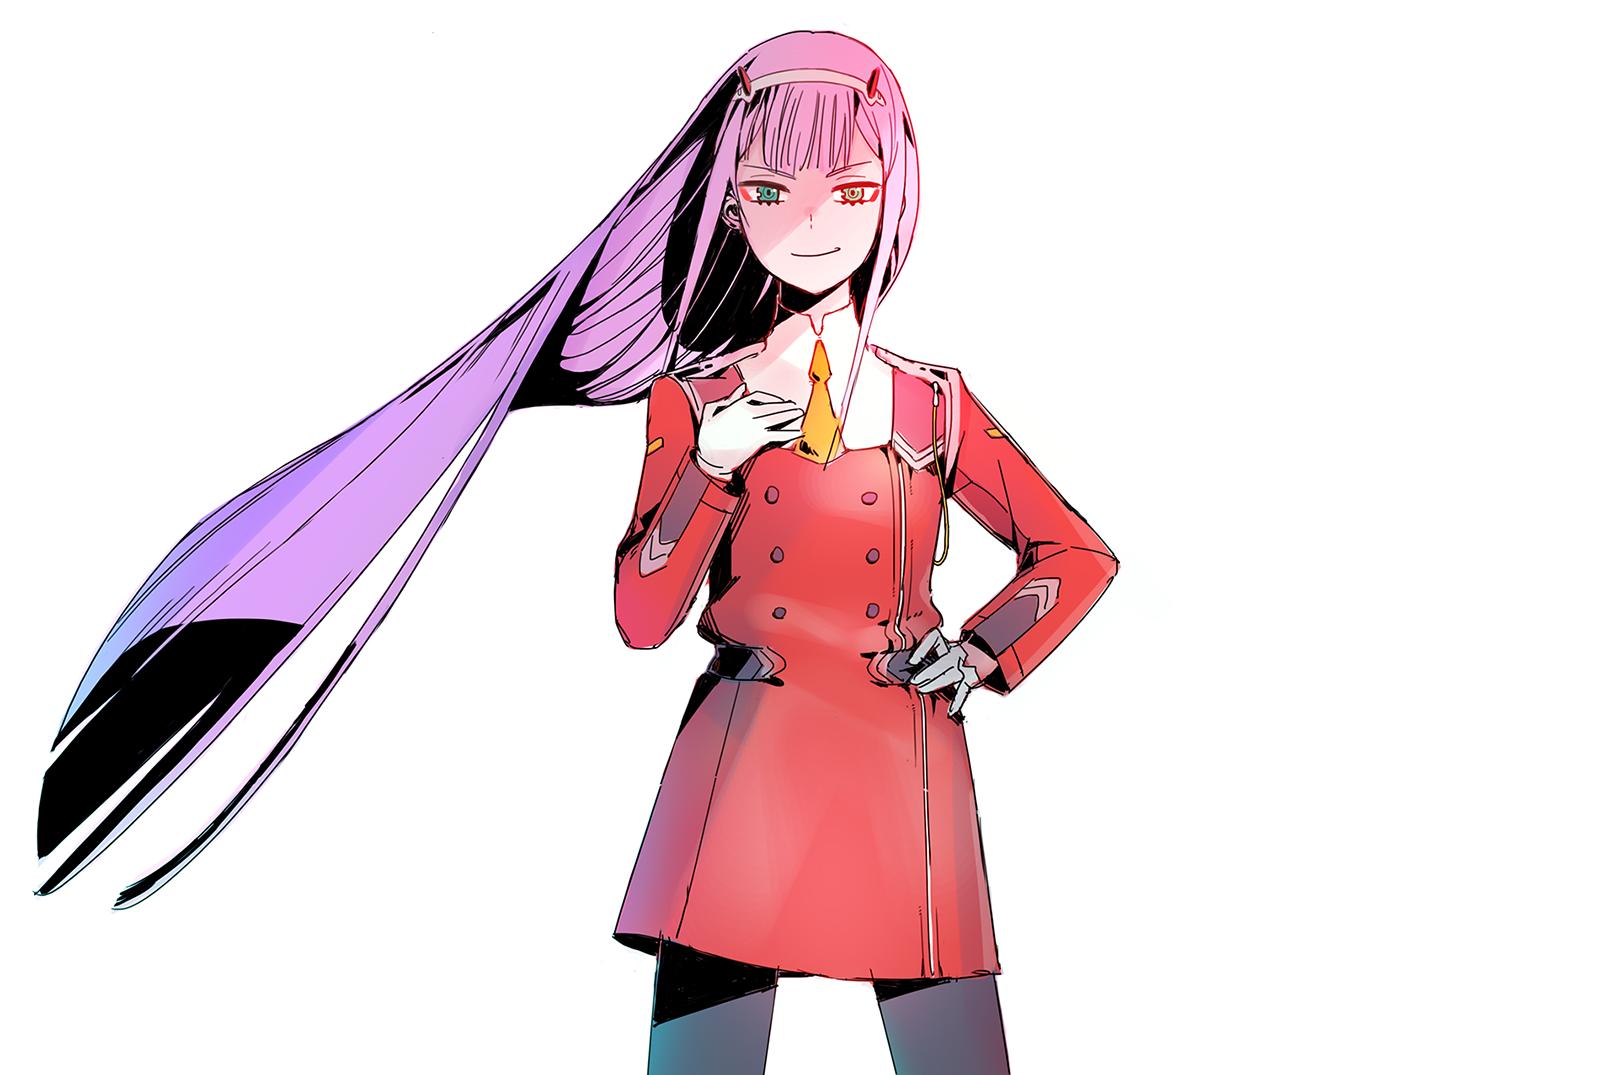 Anime Darling in the FranXX Zero Two (Darling in the FranXX) Long